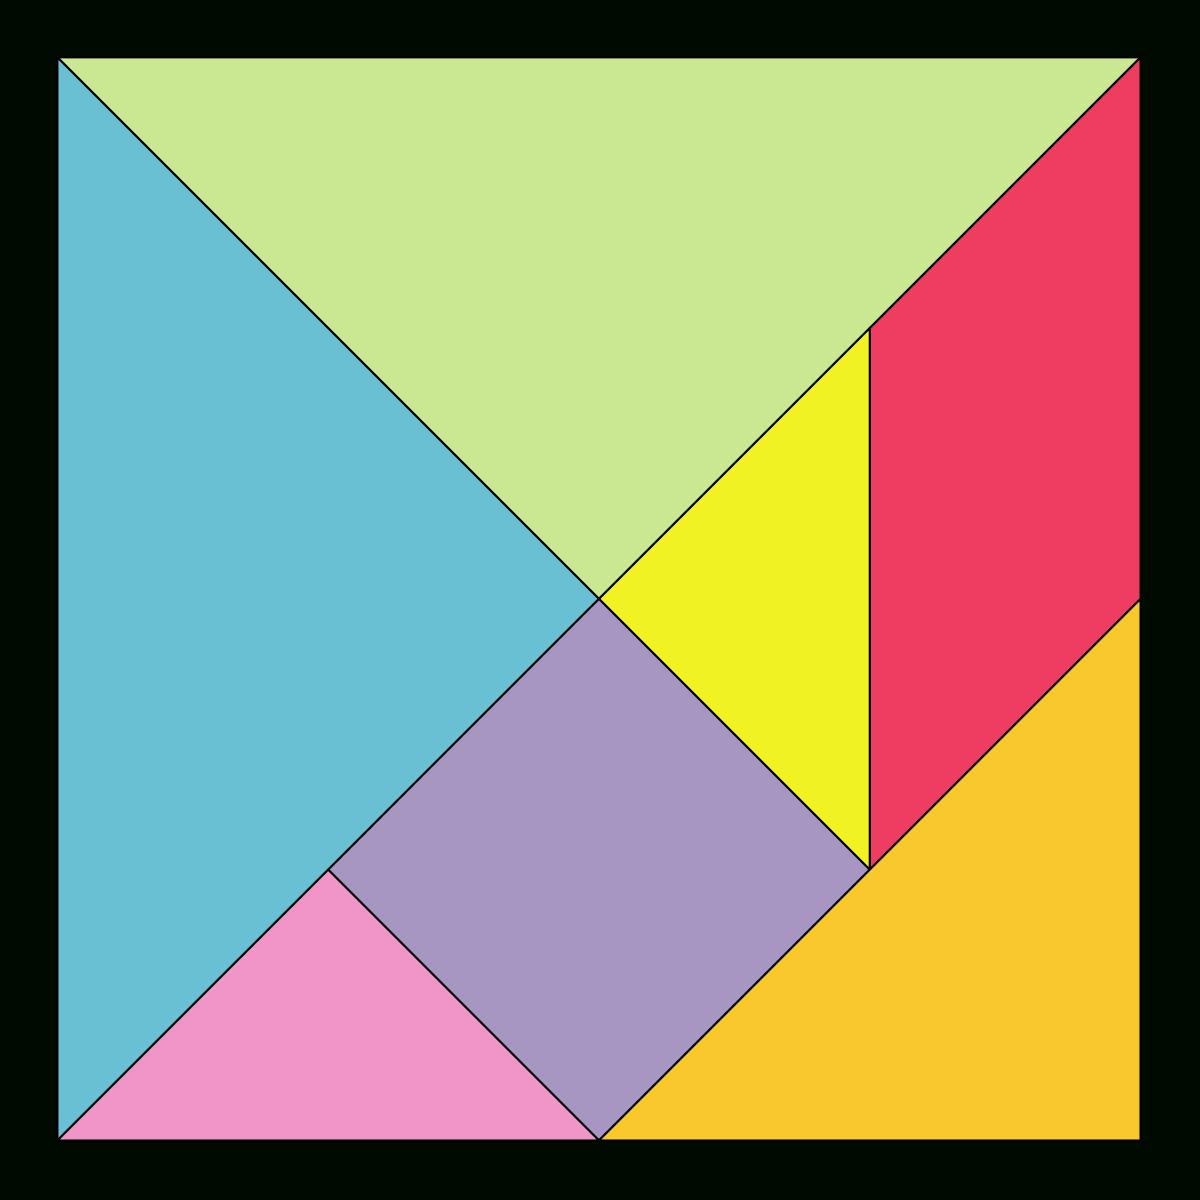 Tangram – Wikipedia ganzes Tangram Figuren